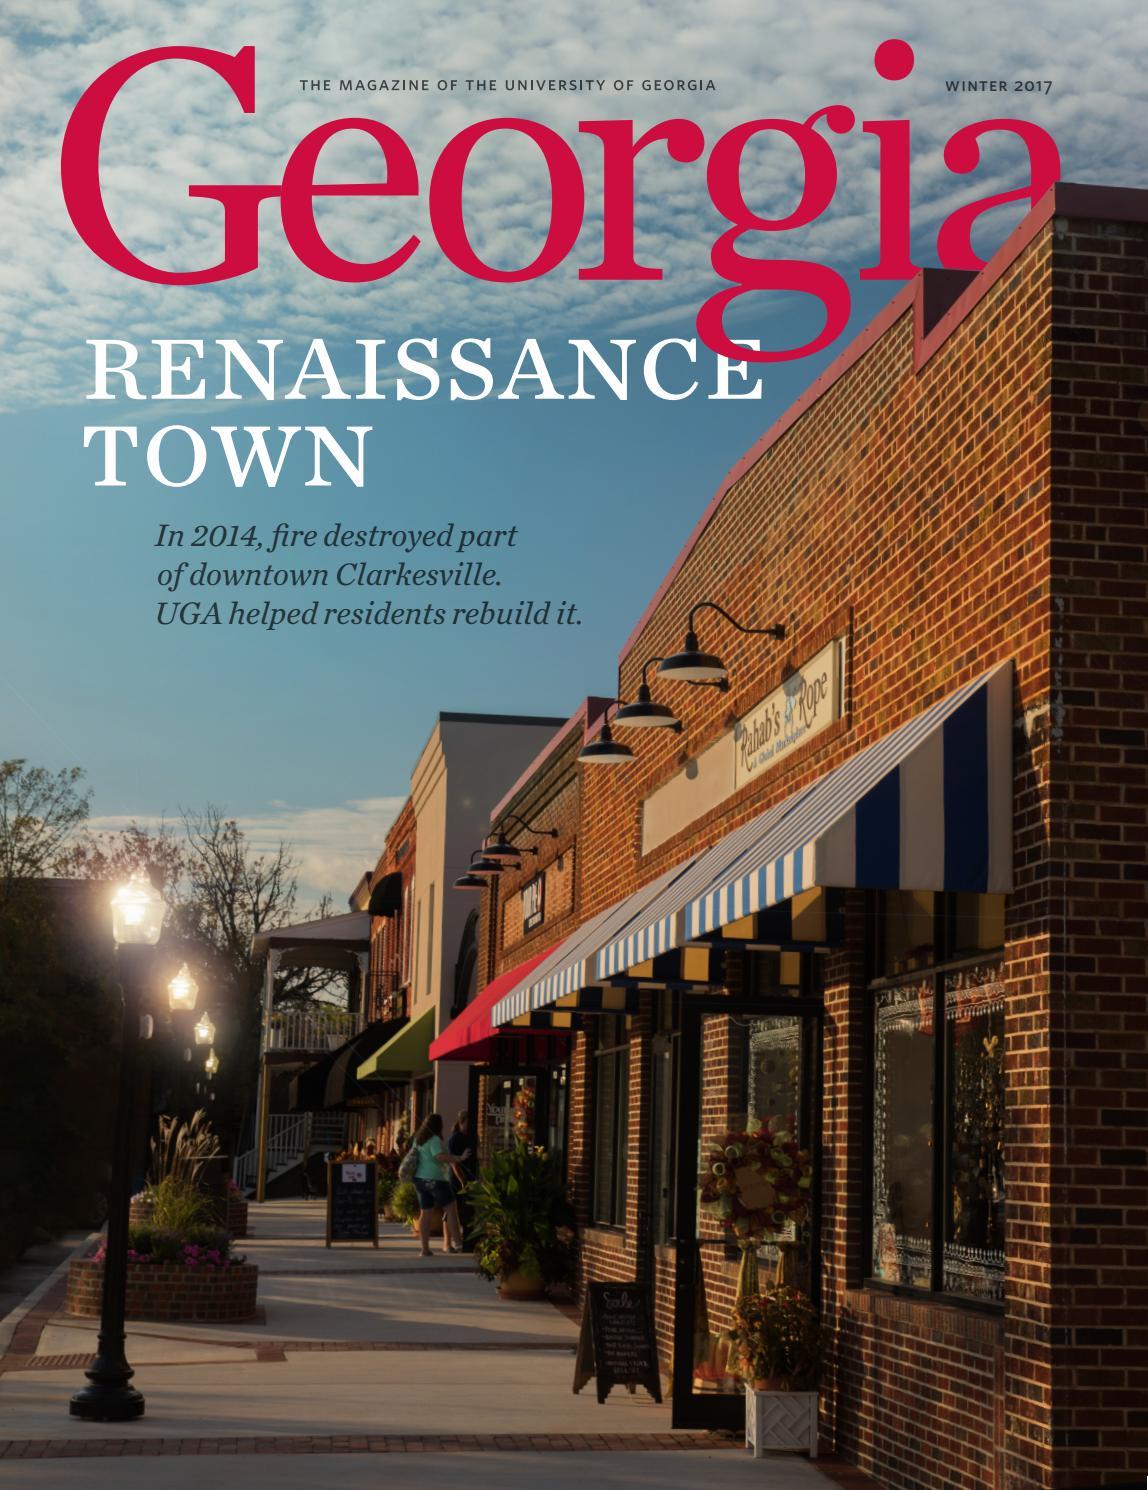 University Of Georgia Magazine Winter 2017 By University Of Georgia